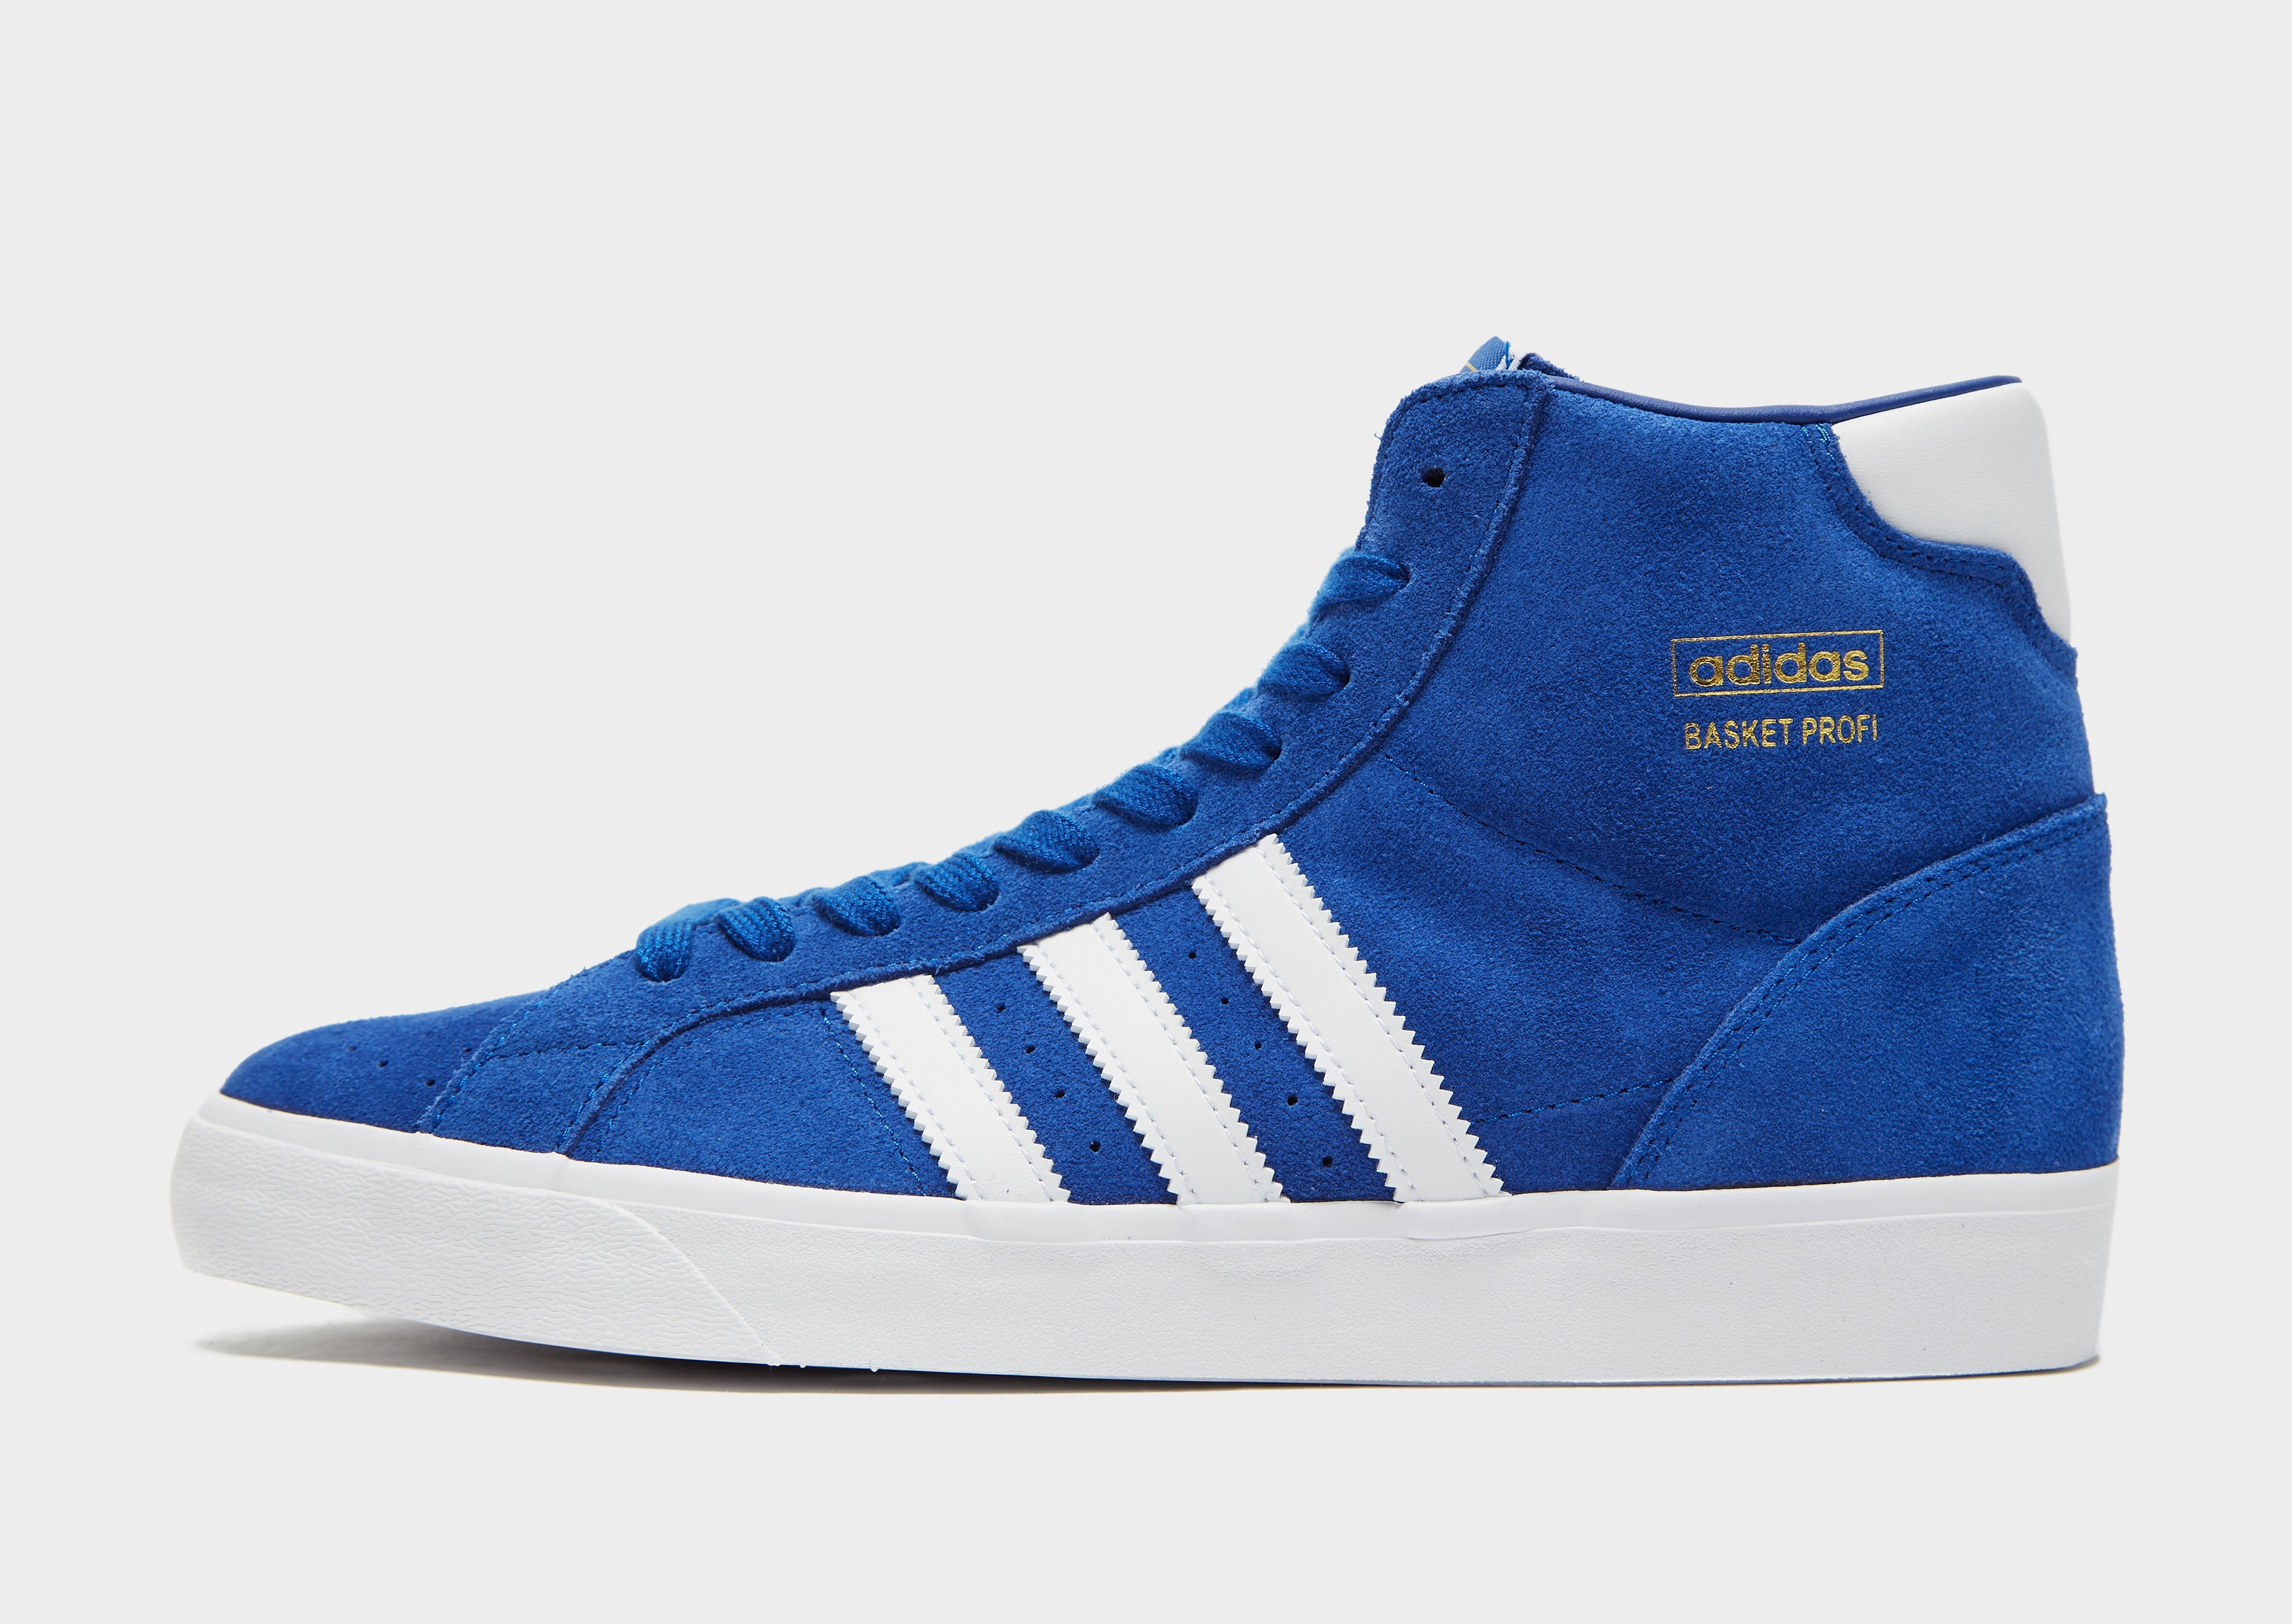 adidas Basket Profi Shoes Blue